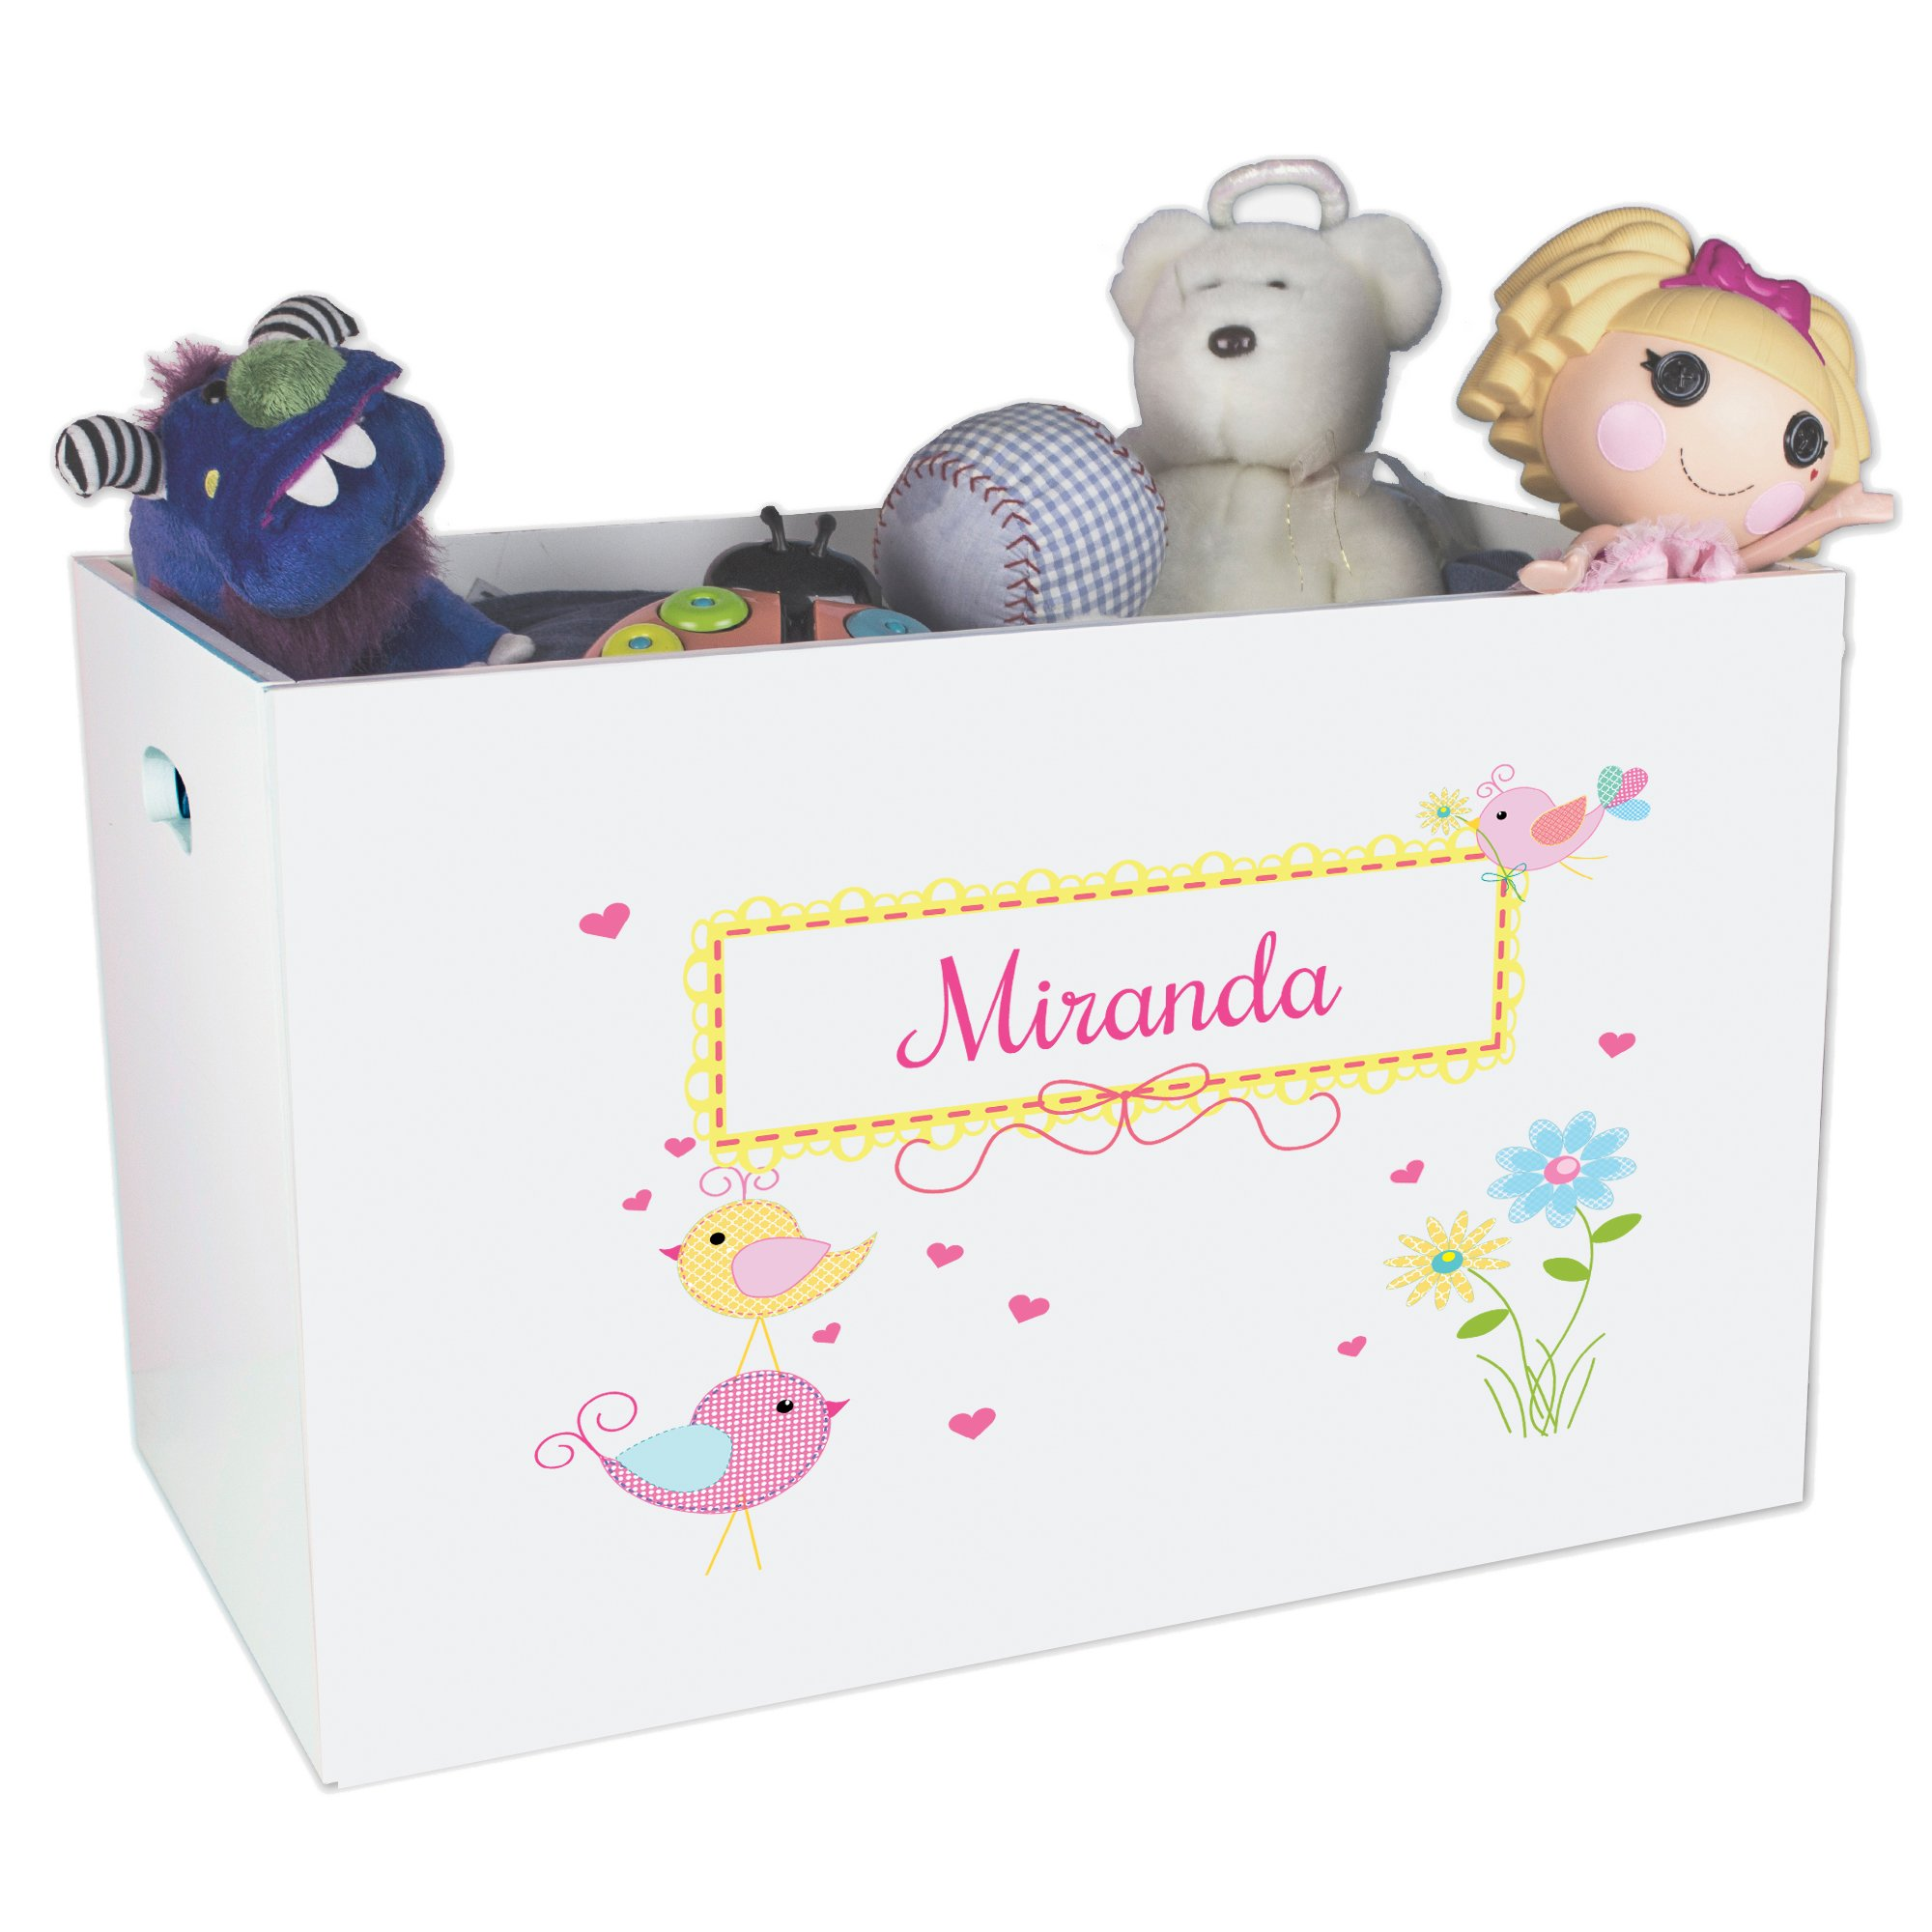 Personalized Birds Childrens Nursery White Open Toy Box by MyBambino